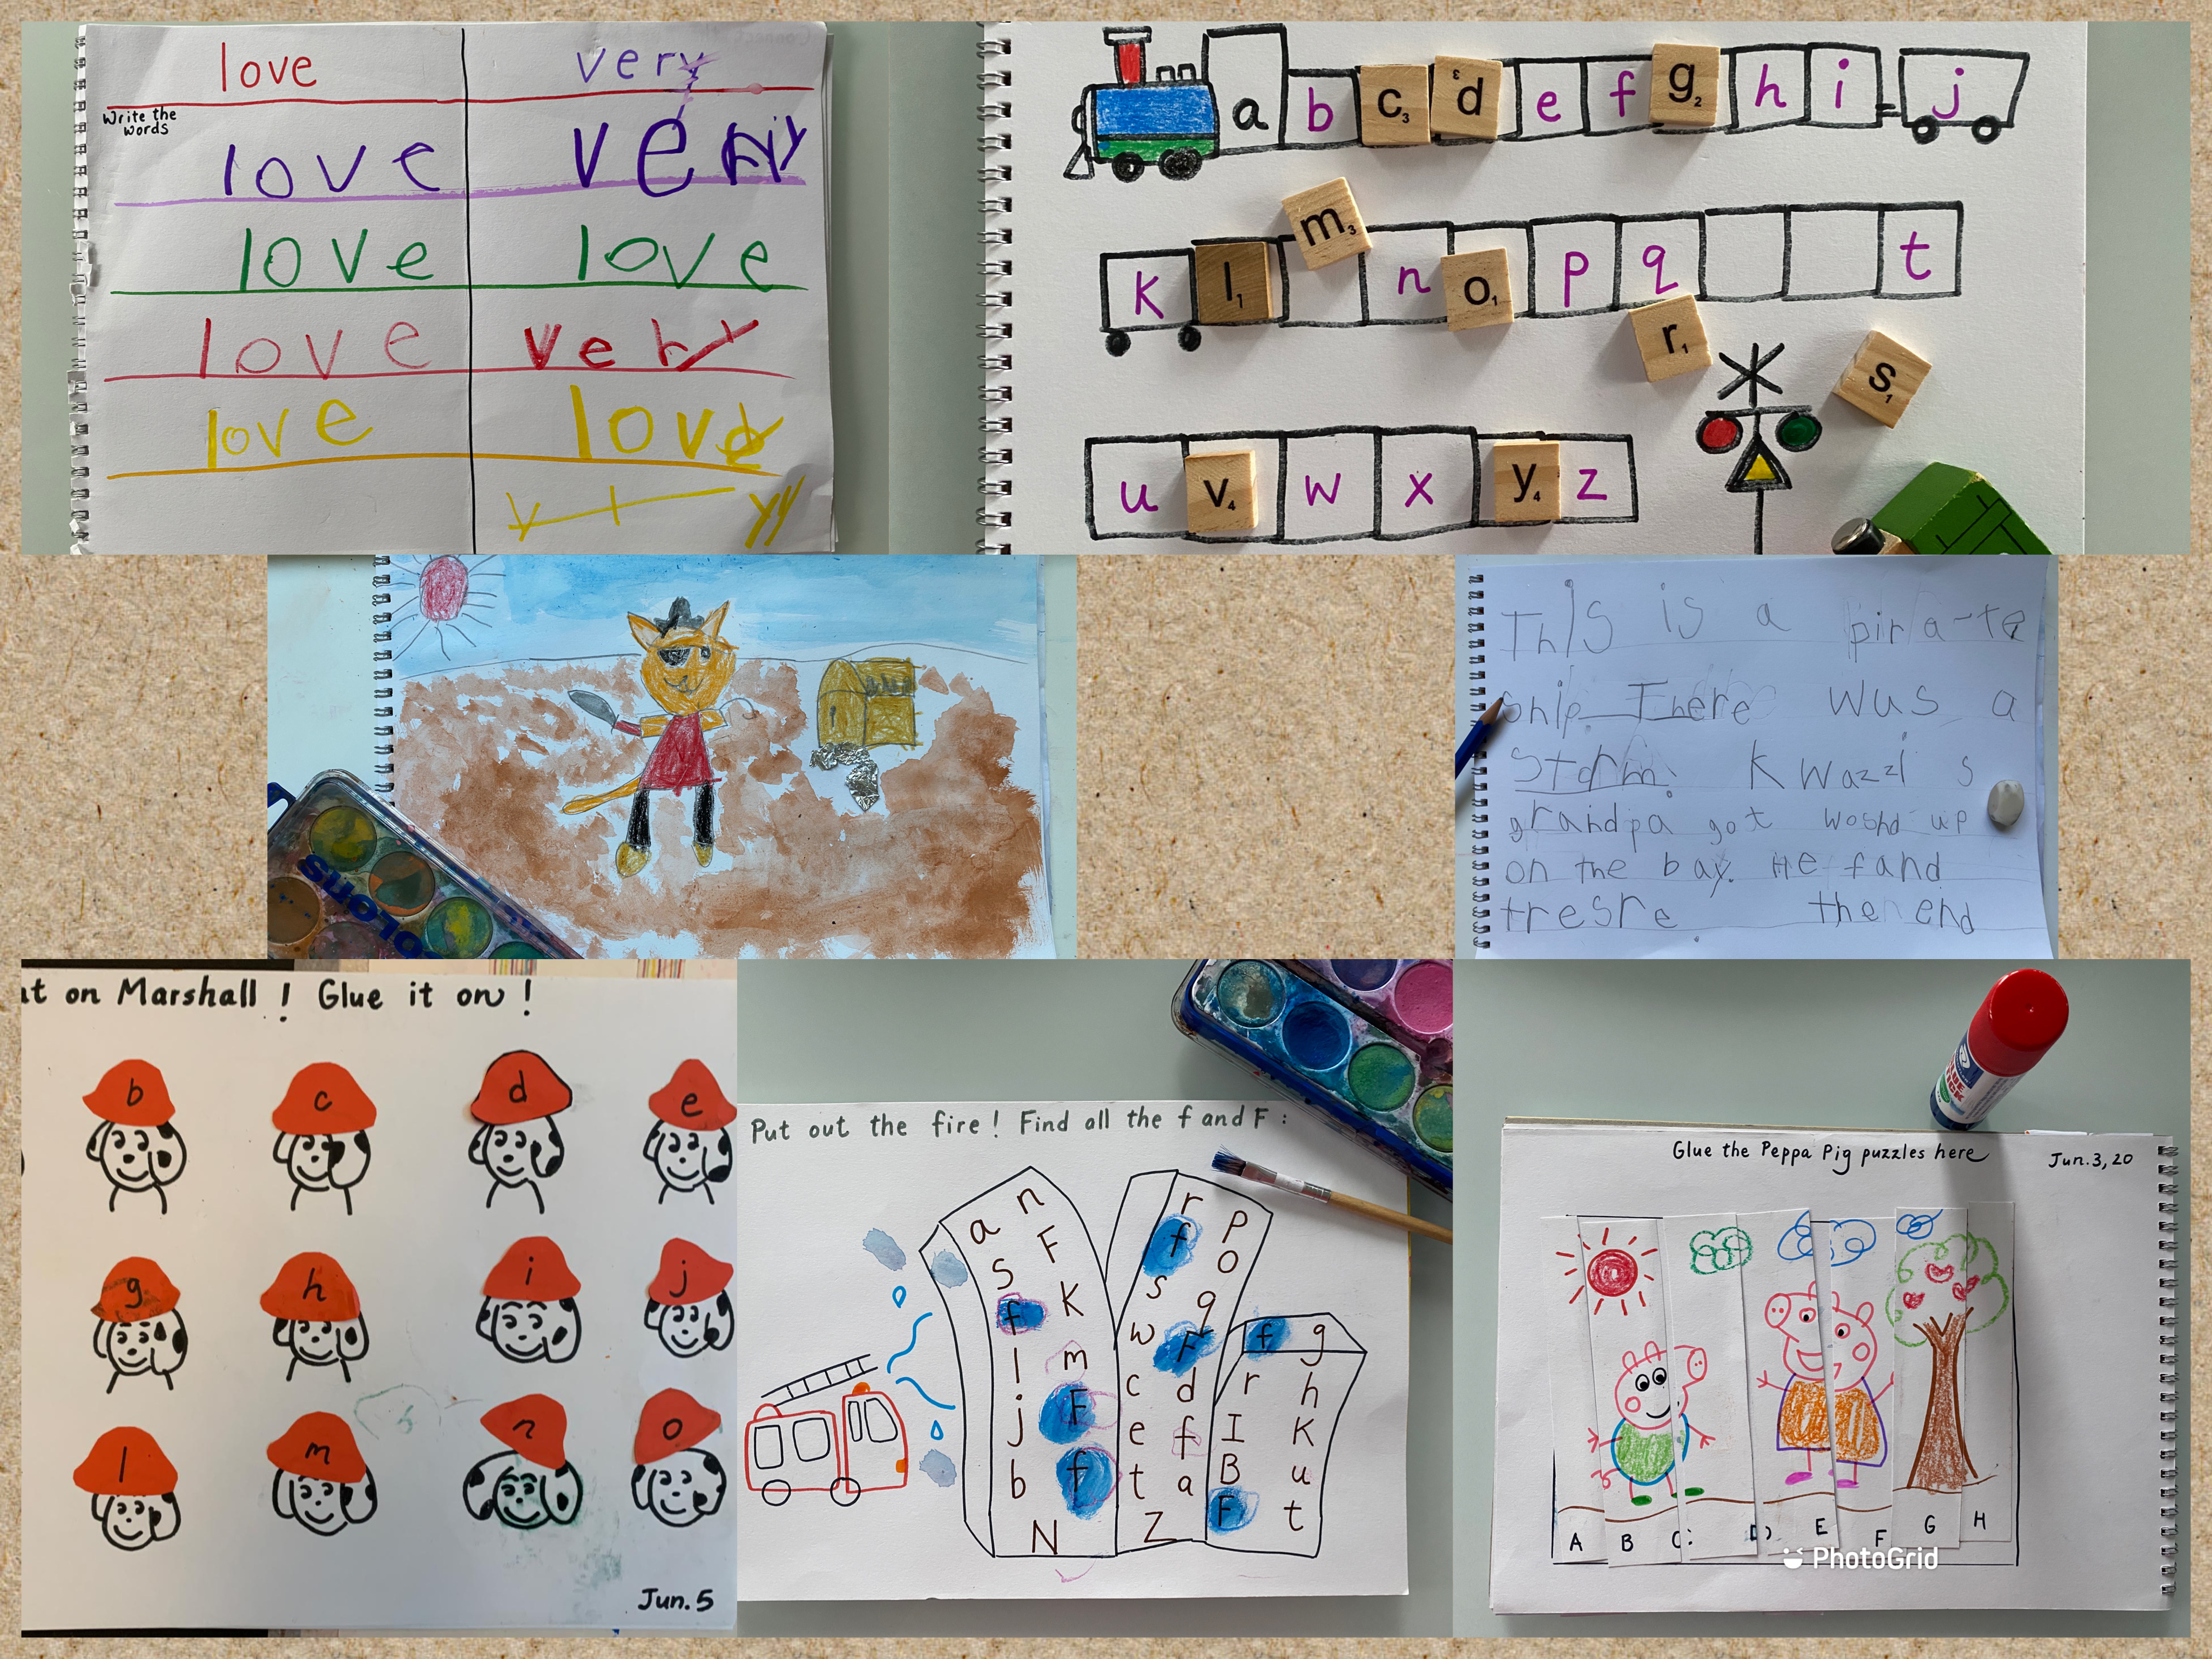 Collage of IG activities